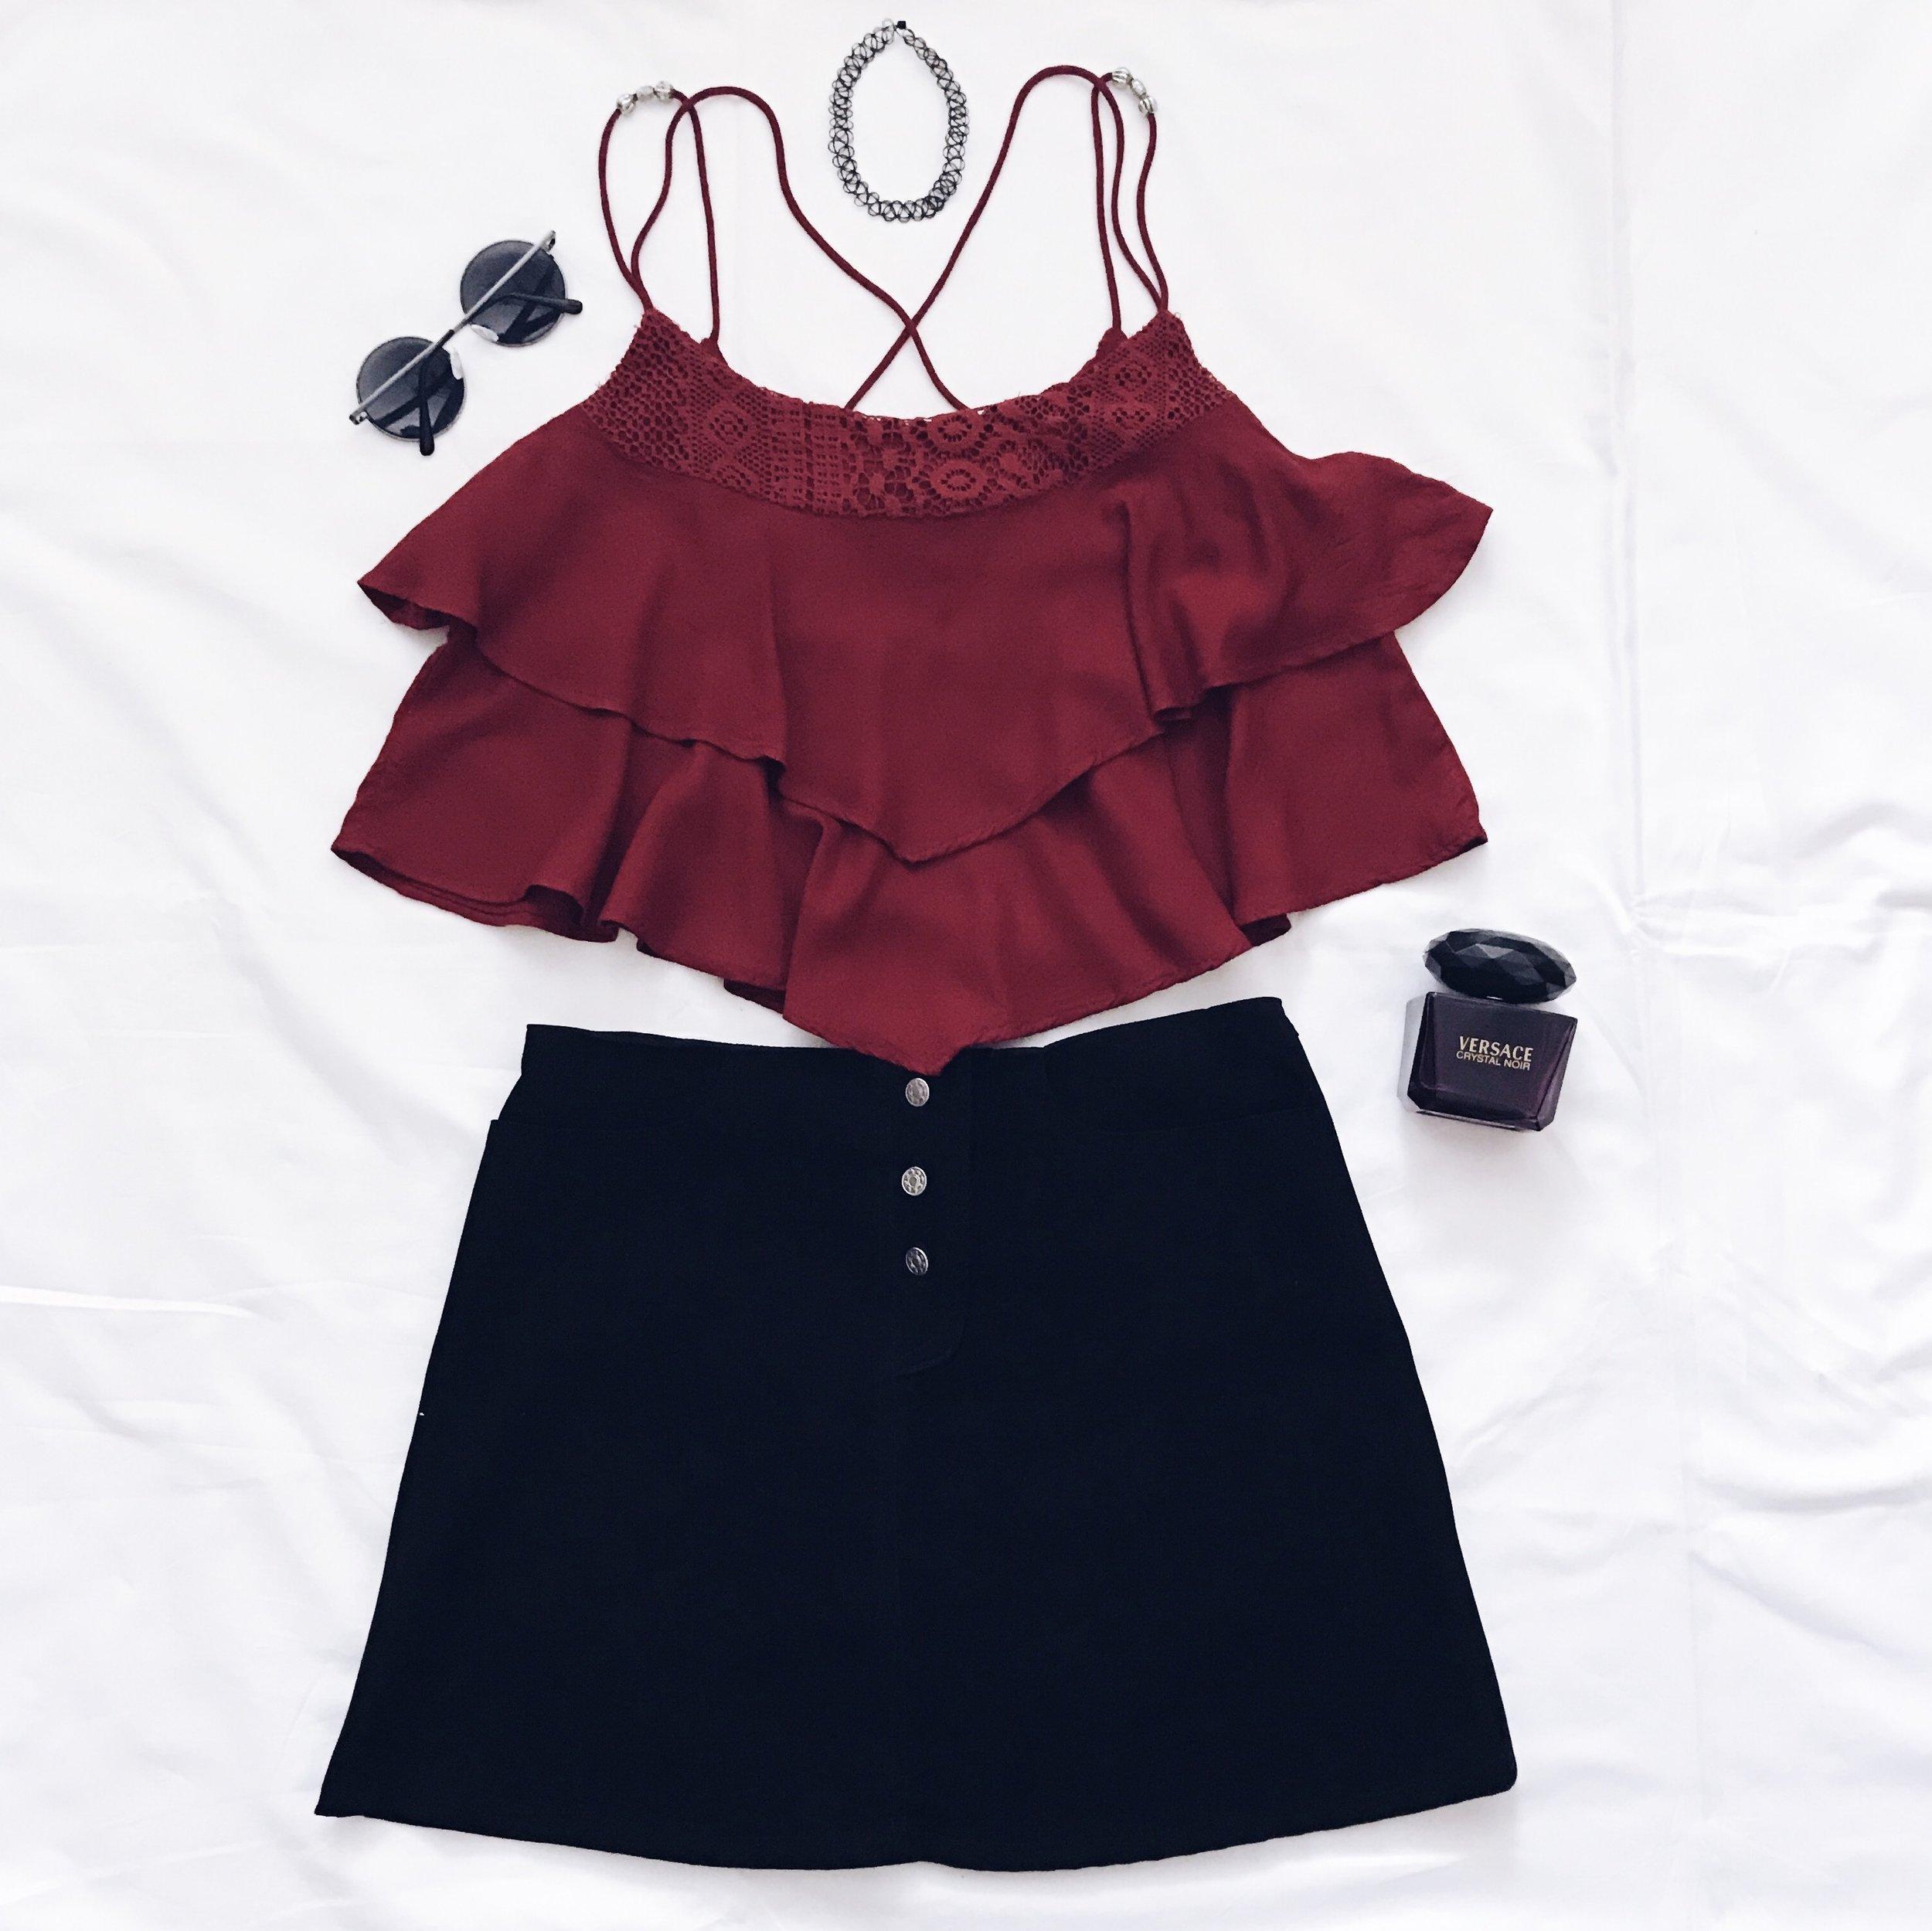 Crop Top & Sunglasses : H&M    Black Skirt: I have no idea :D     Perfume: Versace     Wire Choker: Dolls Kill